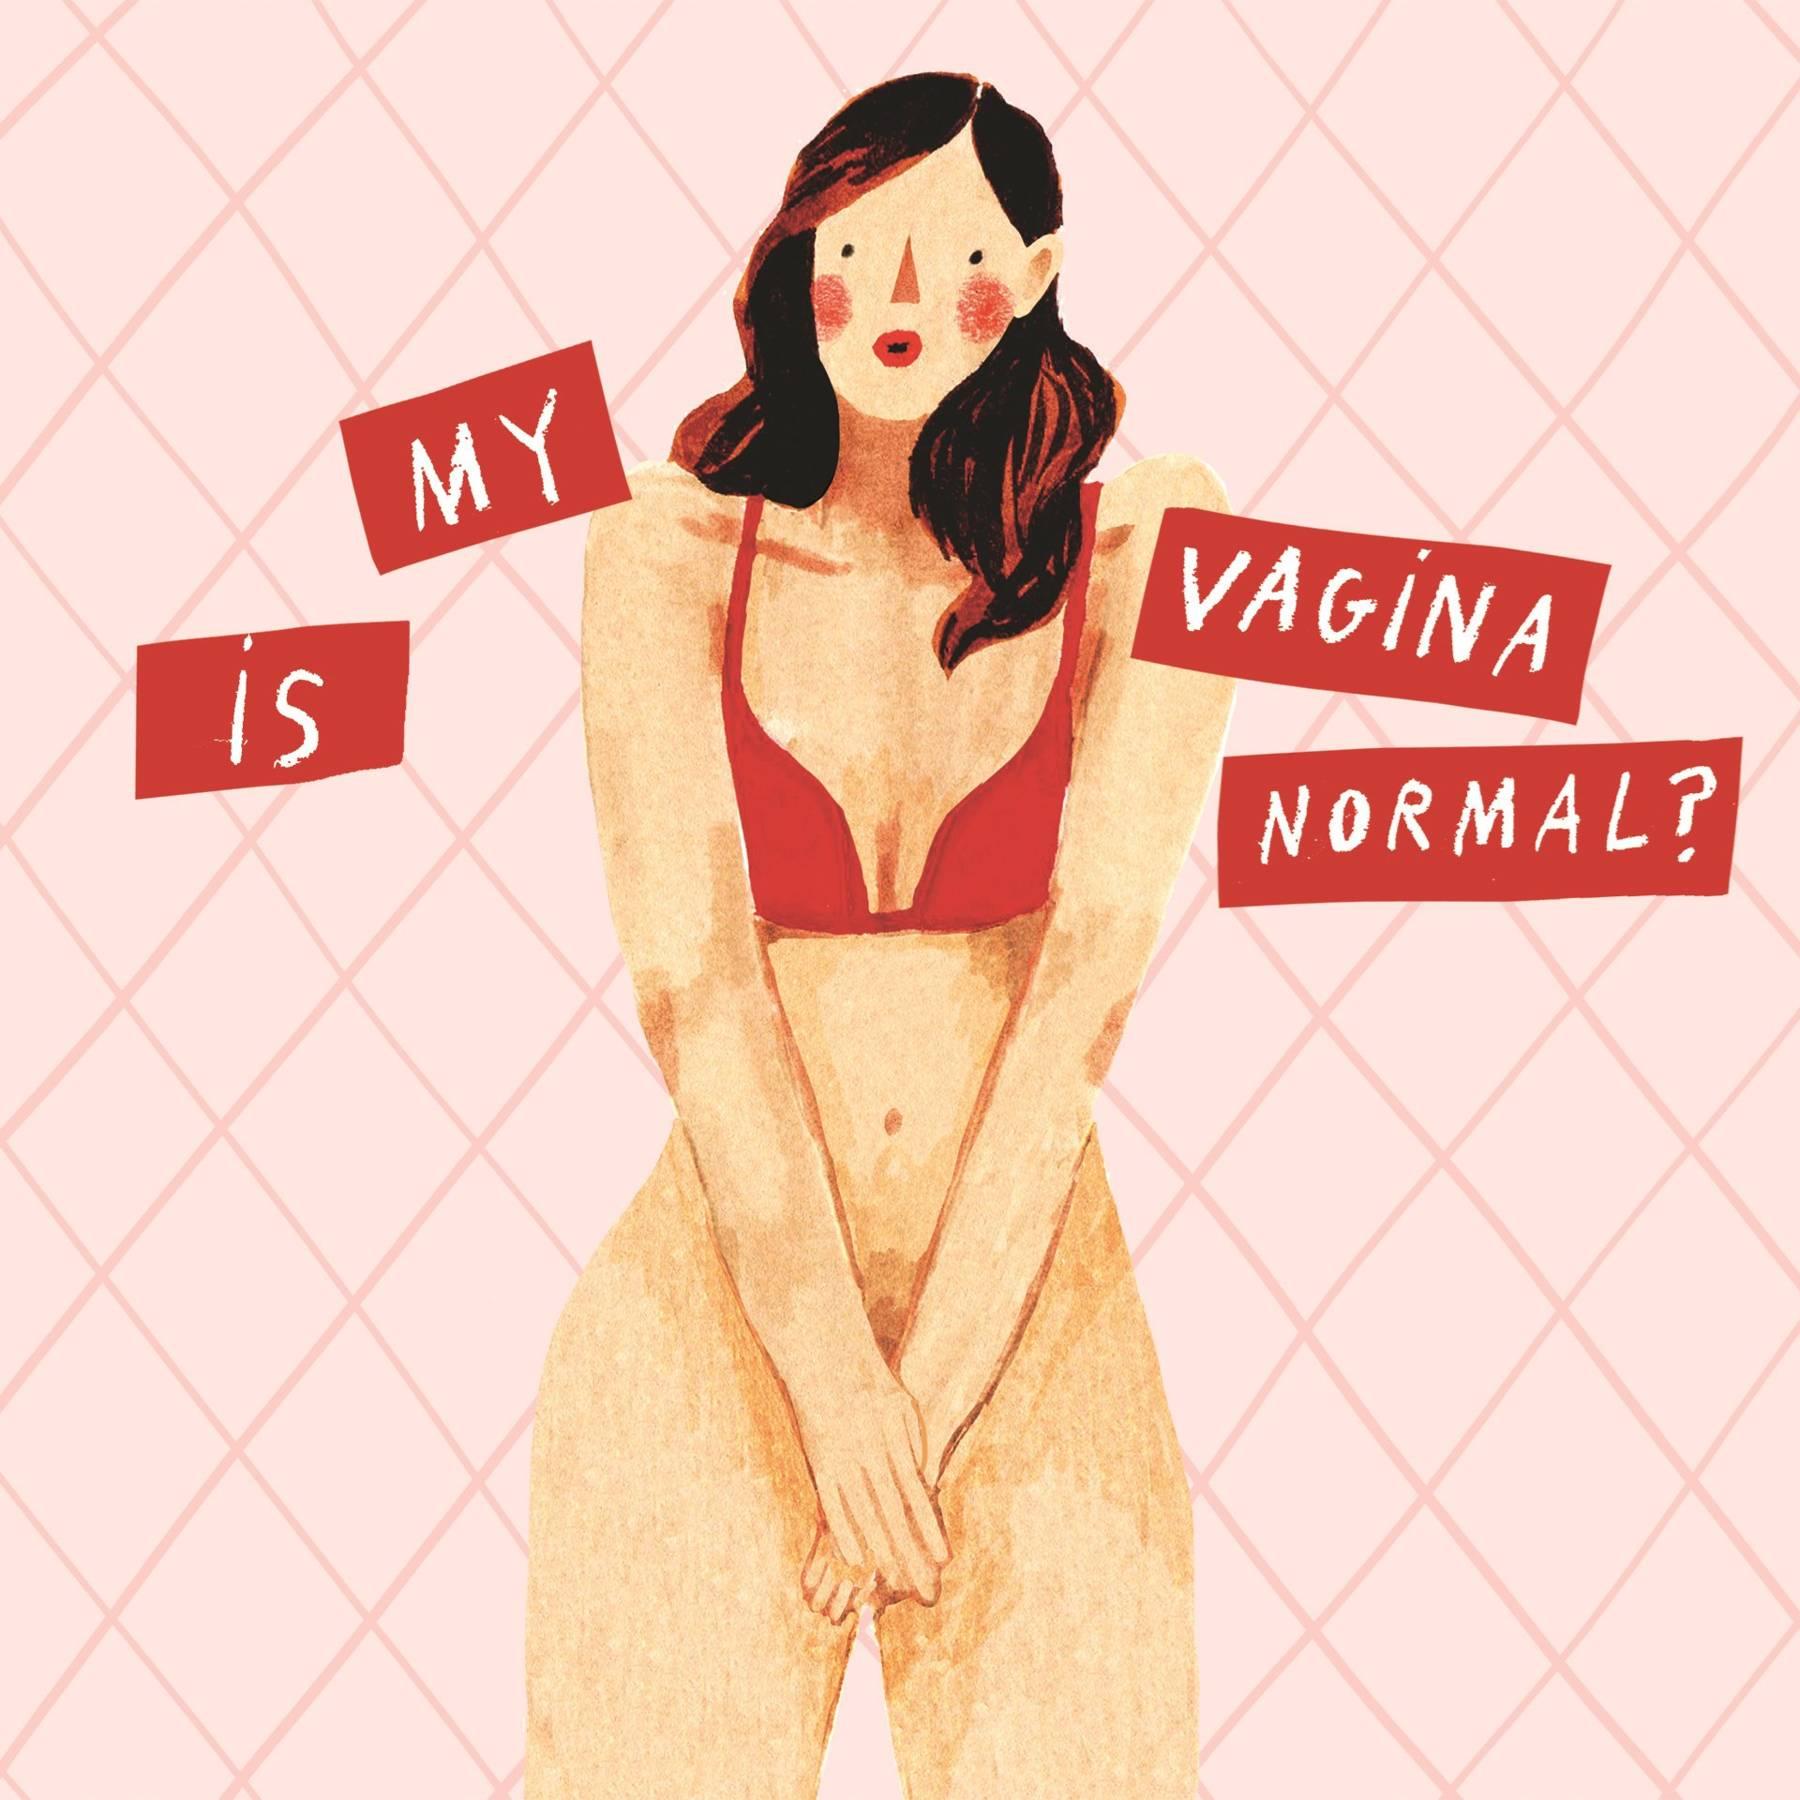 Girls health vagina